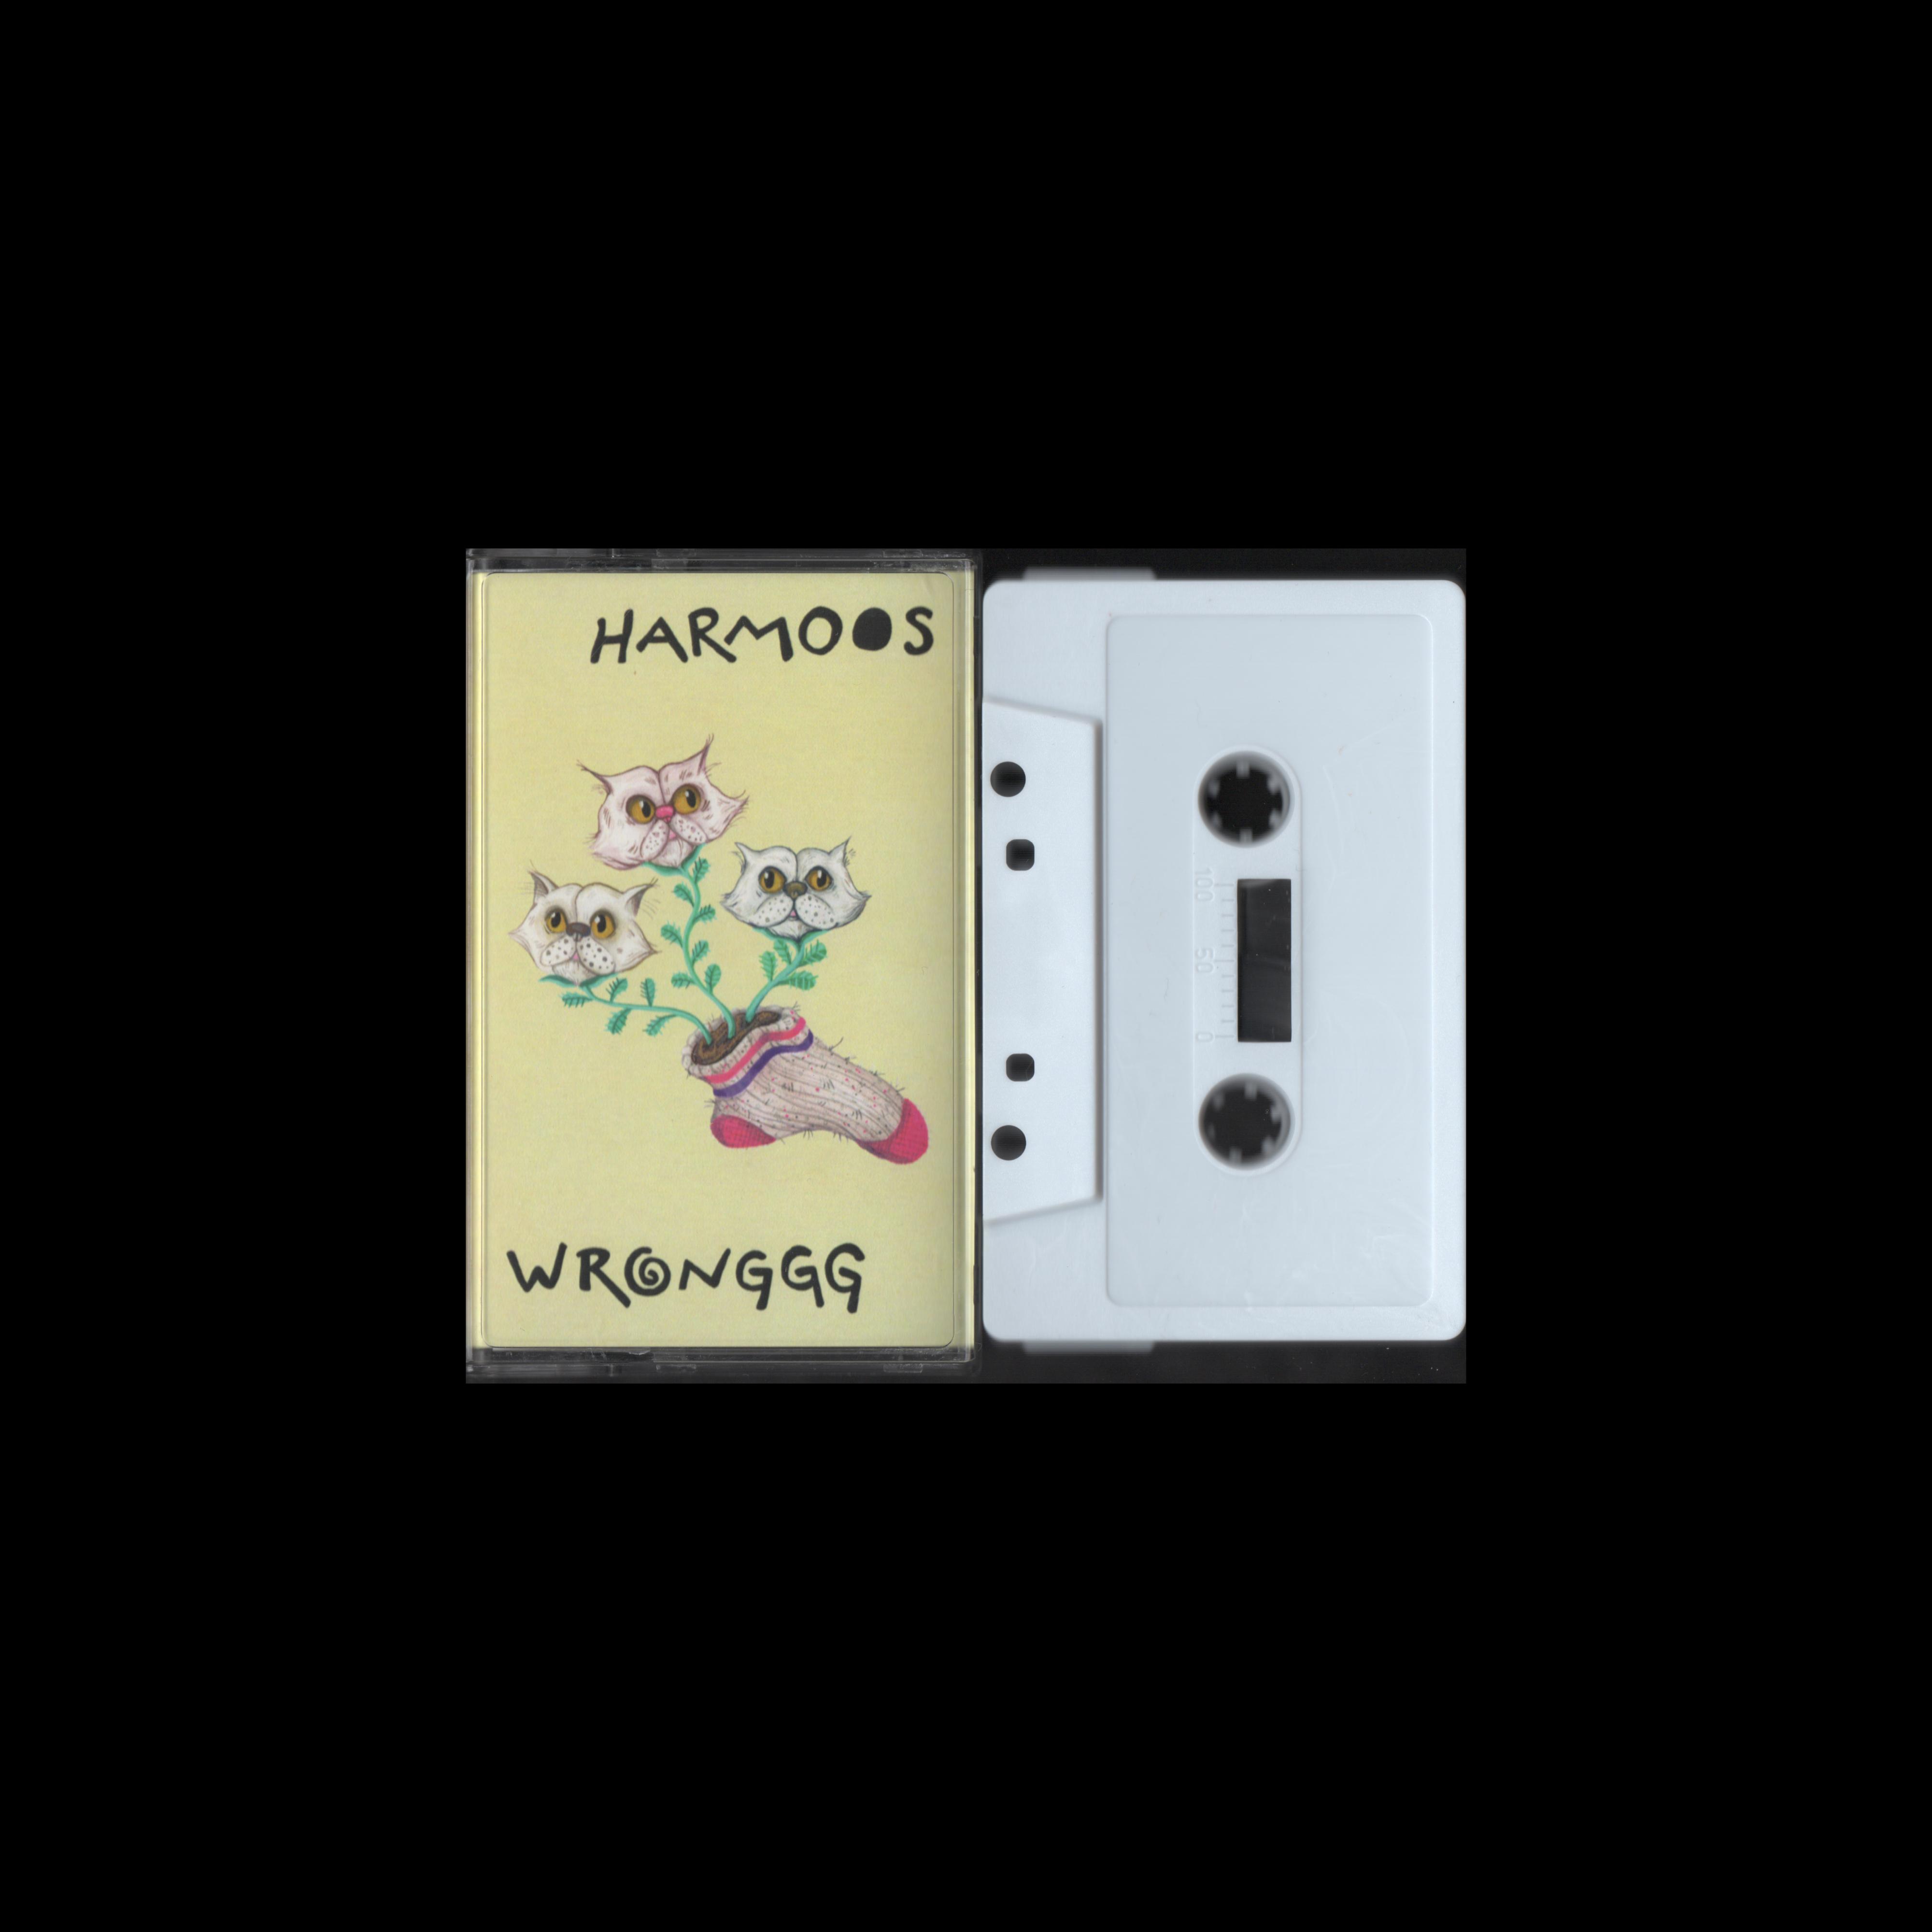 Harmoos - WRONGGG (Dust, Etc.)